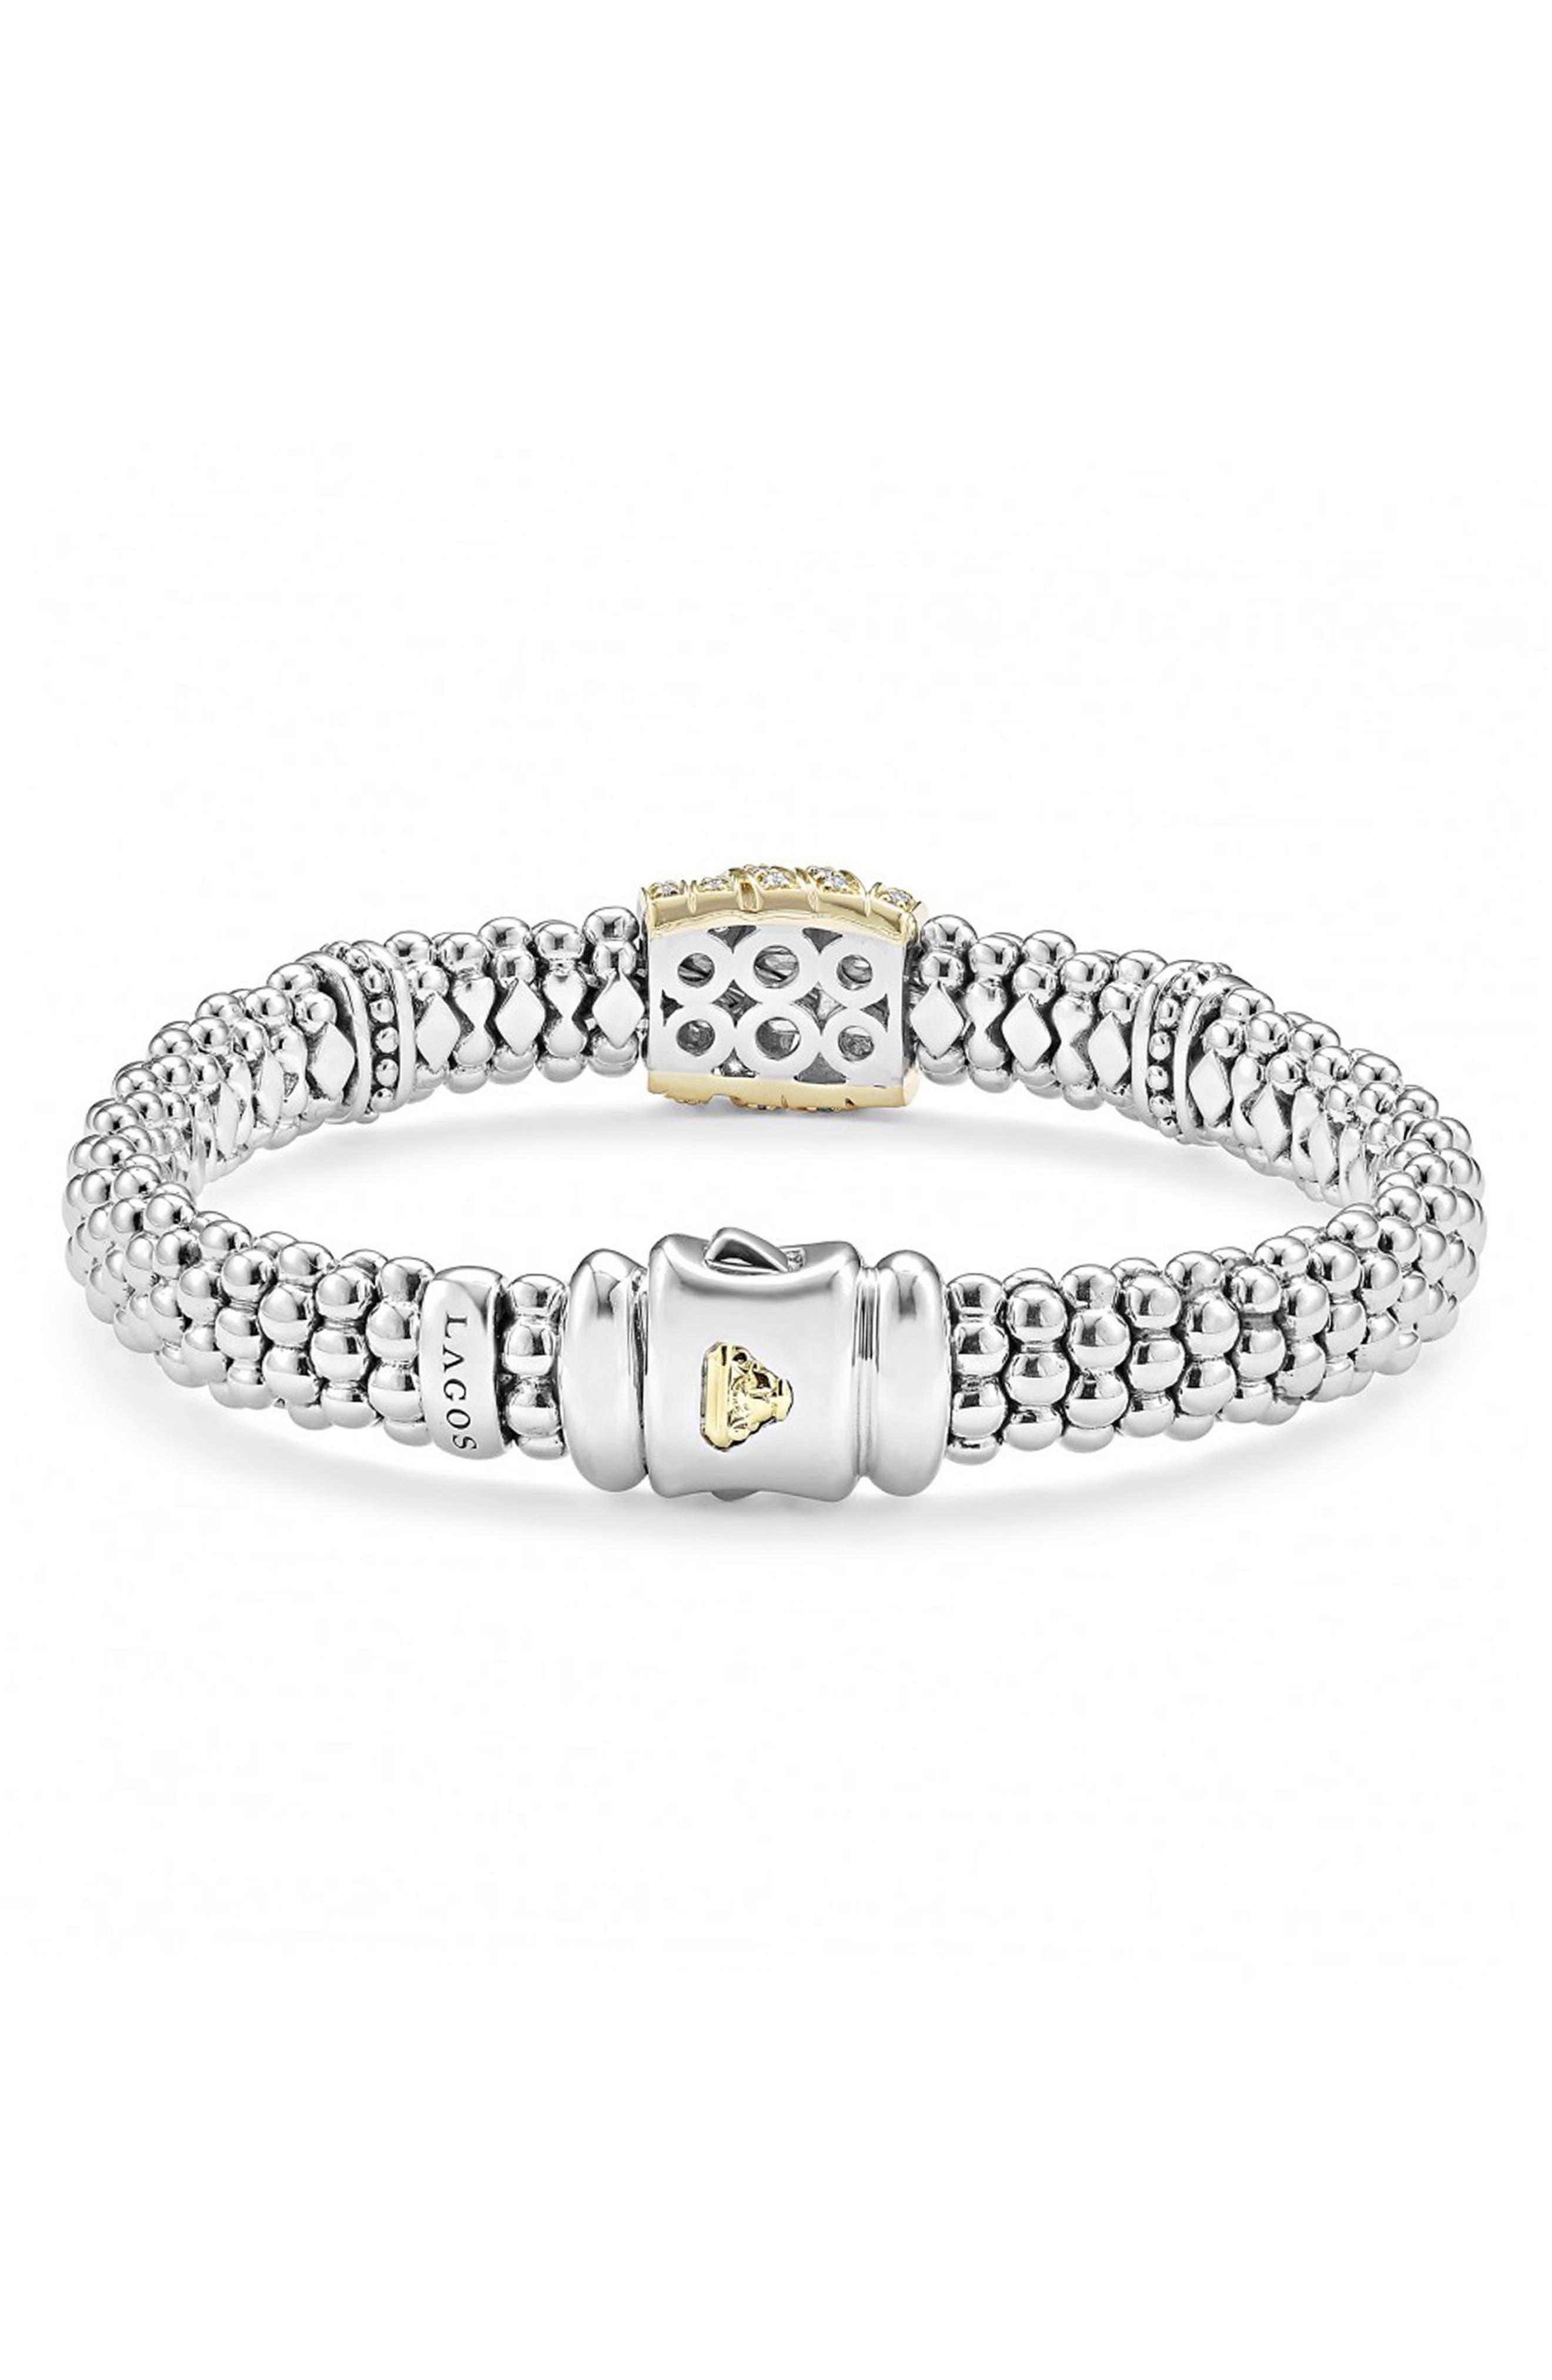 'Diamonds & Caviar' Diamond Rope Bracelet,                             Alternate thumbnail 3, color,                             Sterling Silver/ Gold